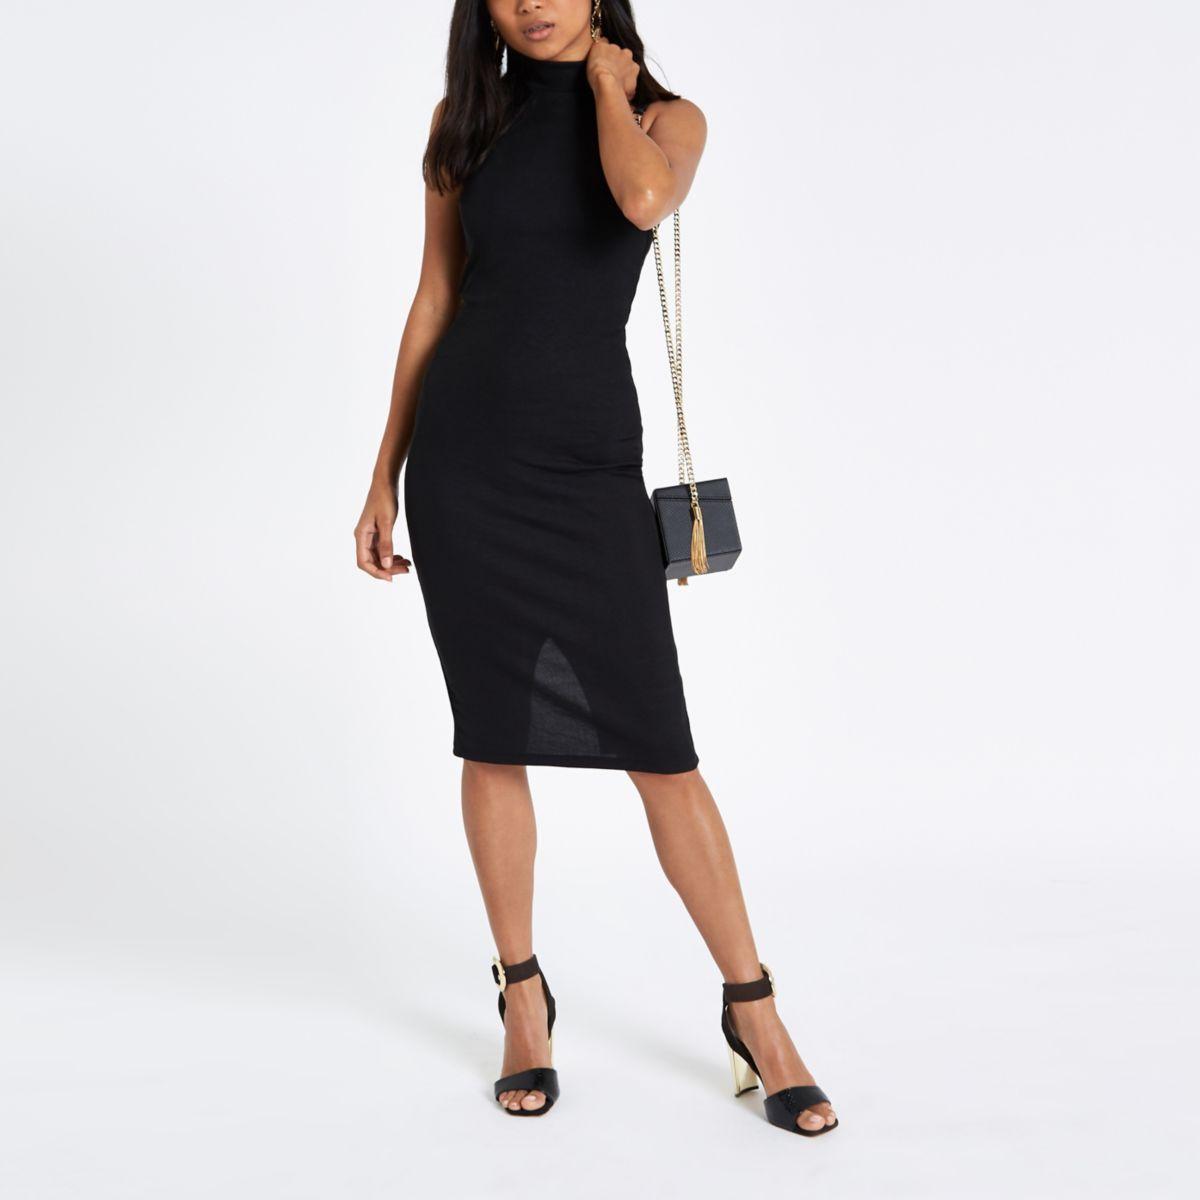 Petite black halter neck midi bodycon dress